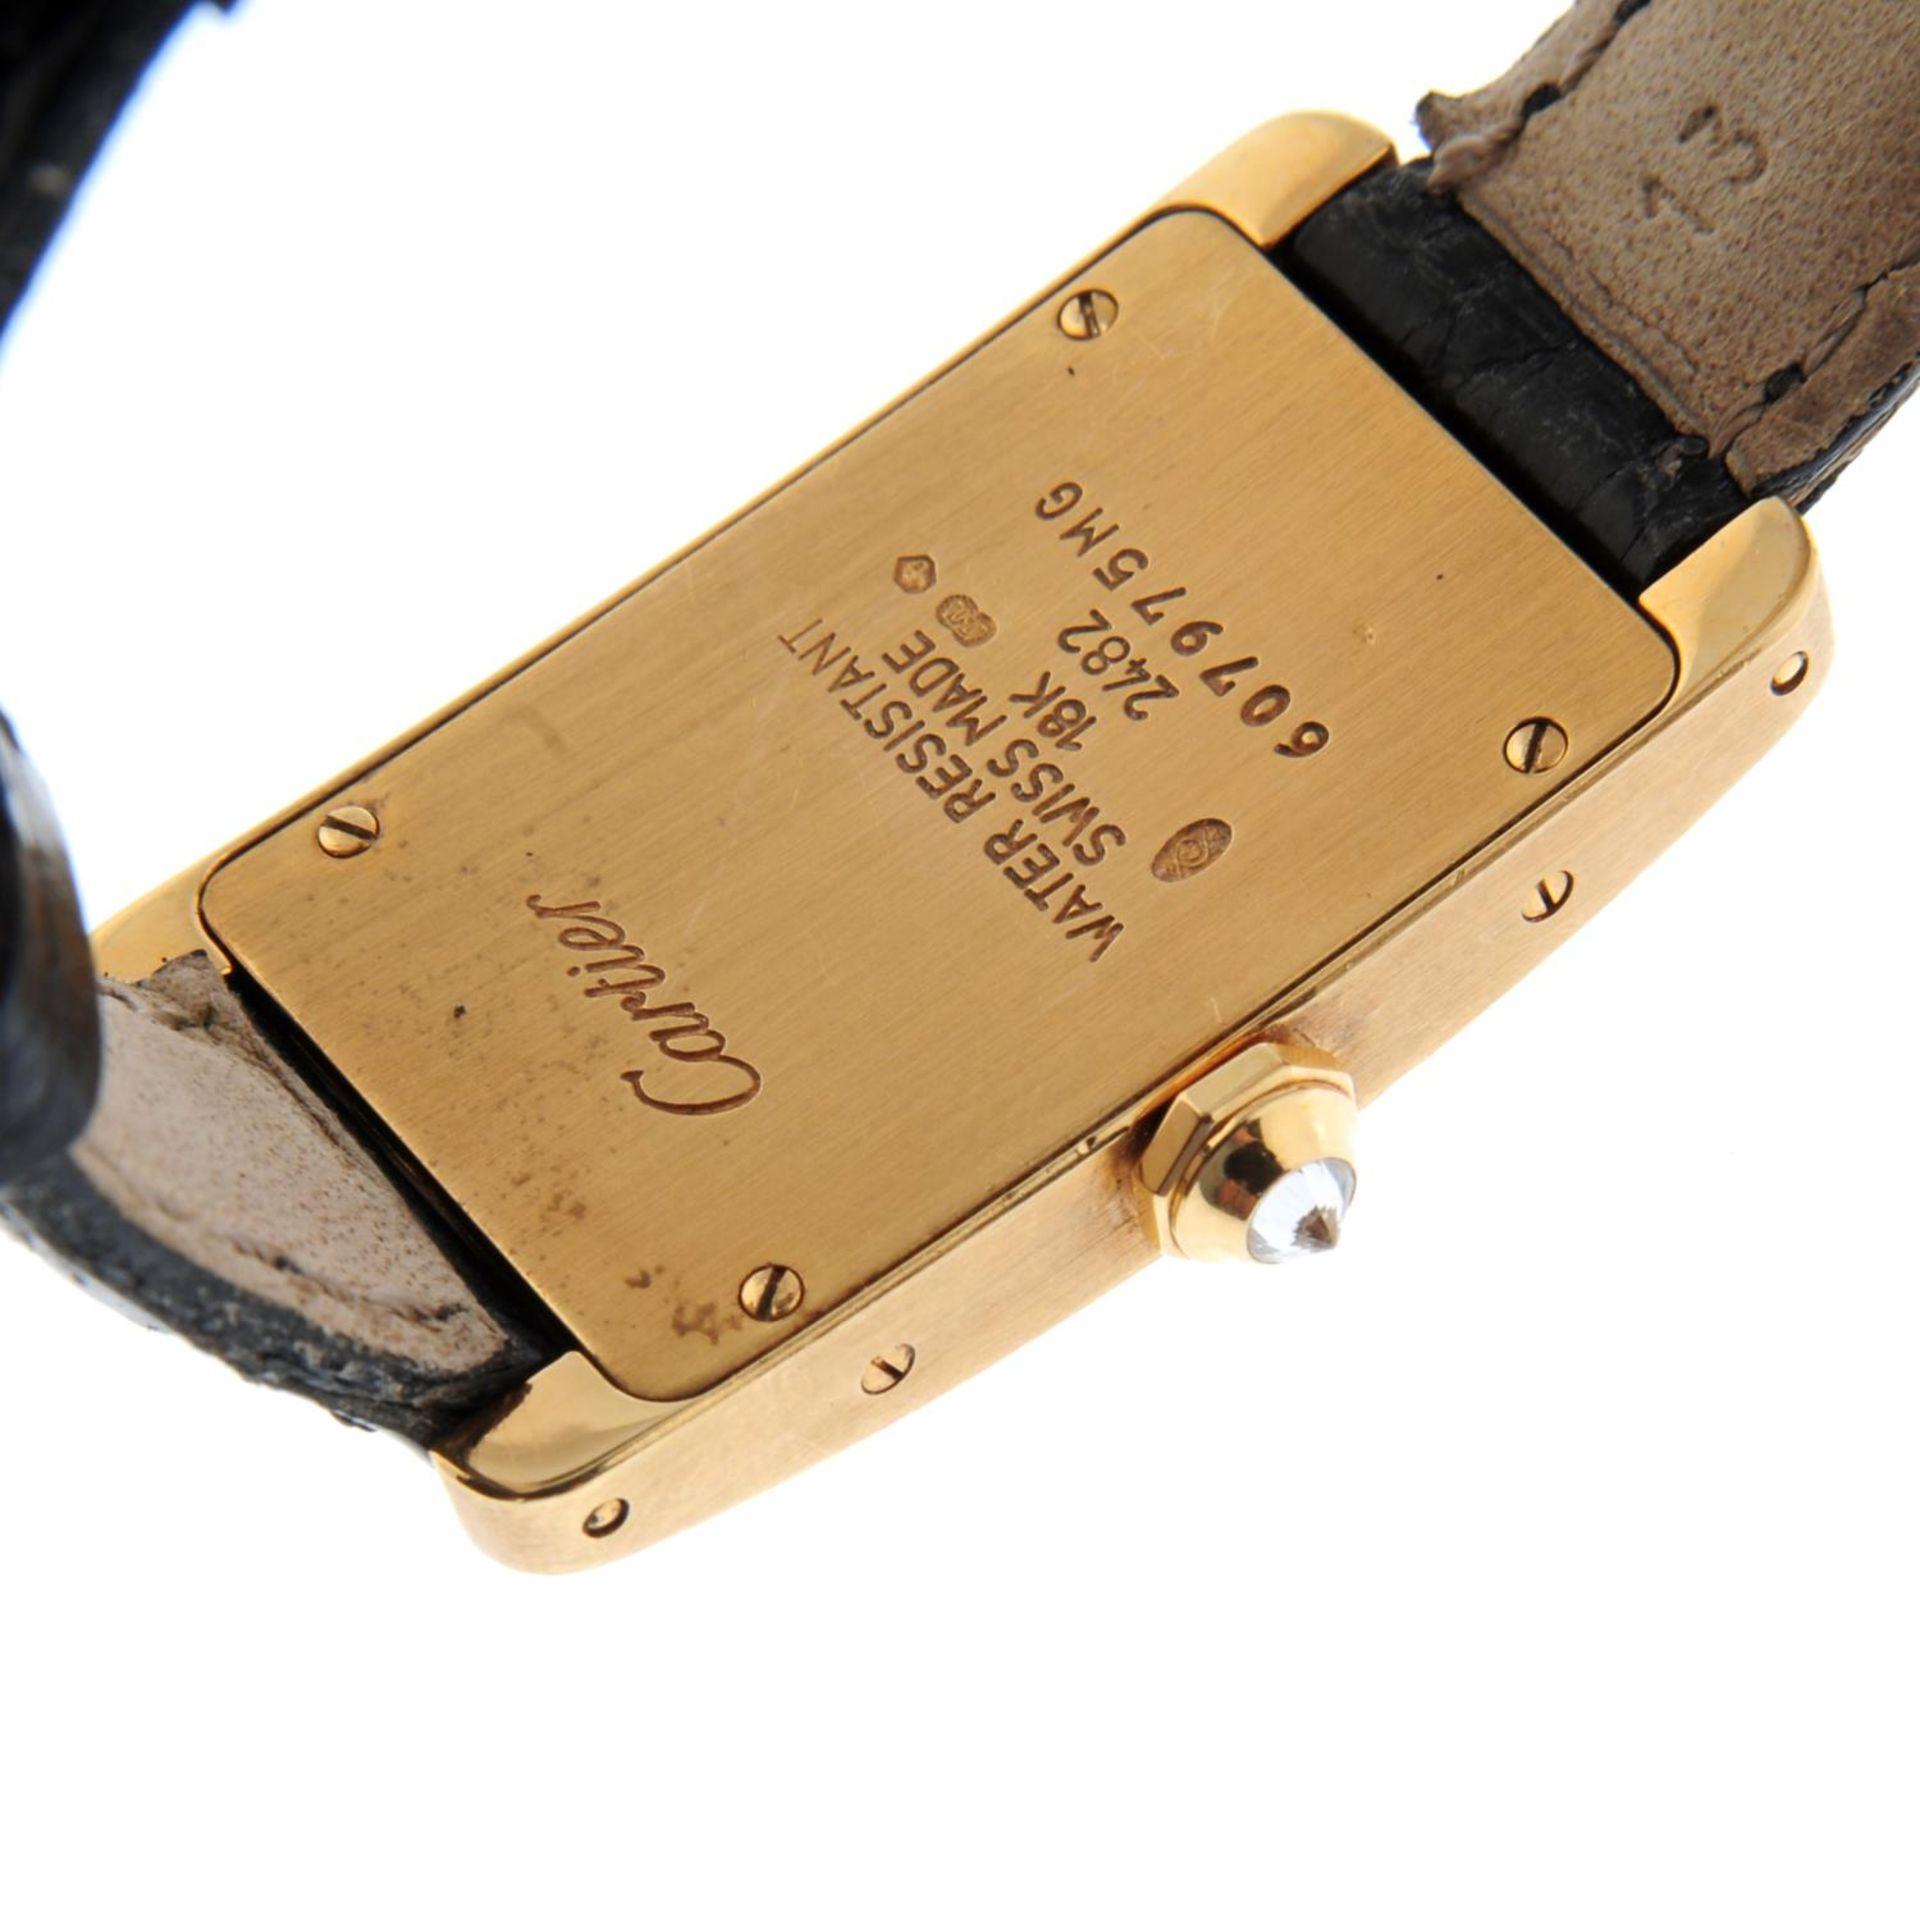 CARTIER - a Tank Americaine wrist watch. - Bild 2 aus 4